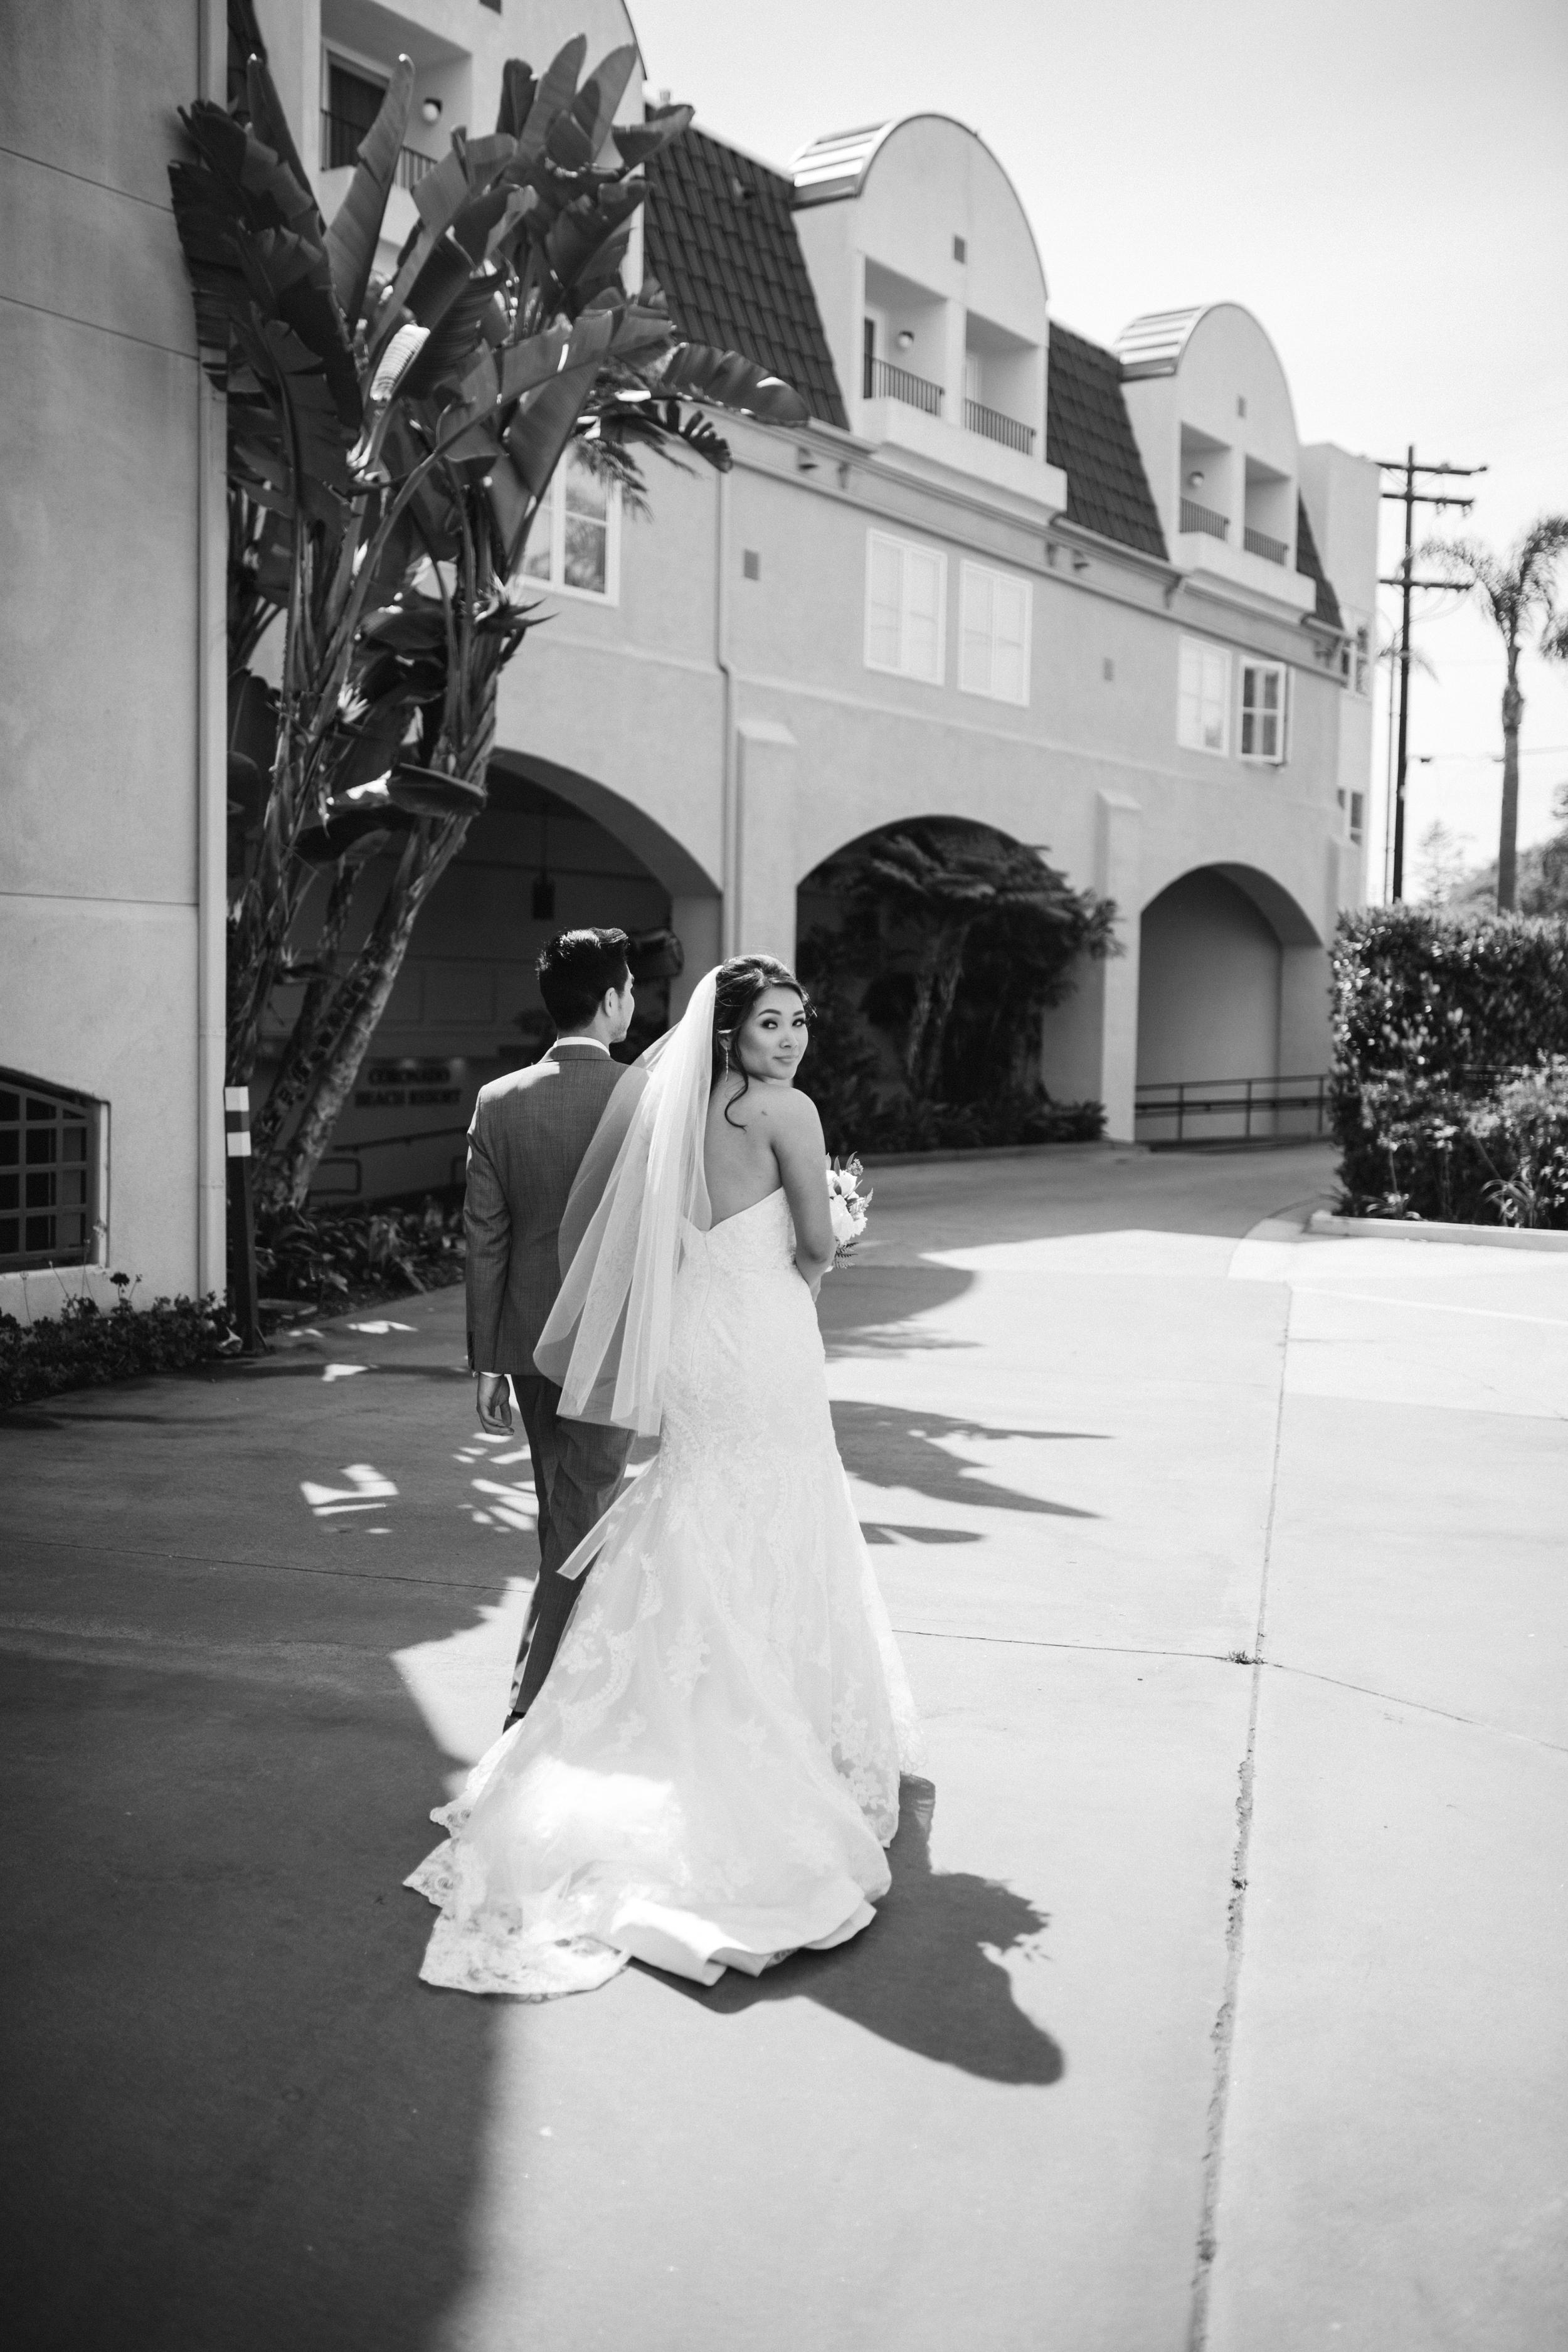 wedding_coronado_community_center-18.jpg